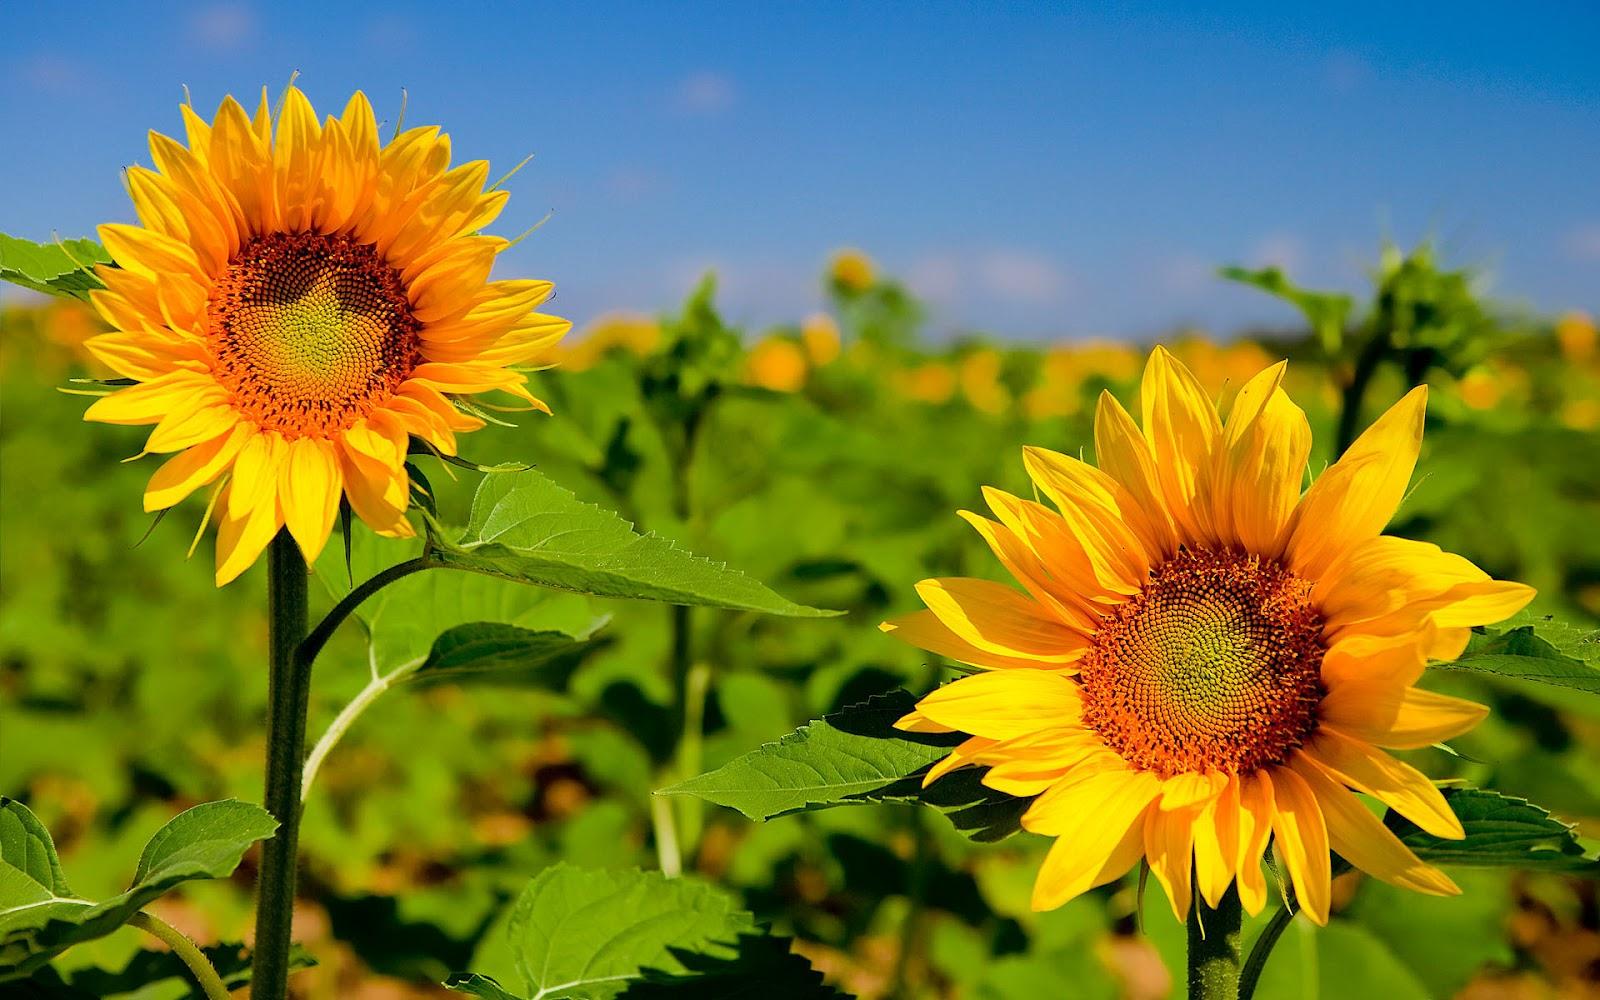 Hd Sunflower Wallpaper Pictures - Desktop Bing , HD Wallpaper & Backgrounds